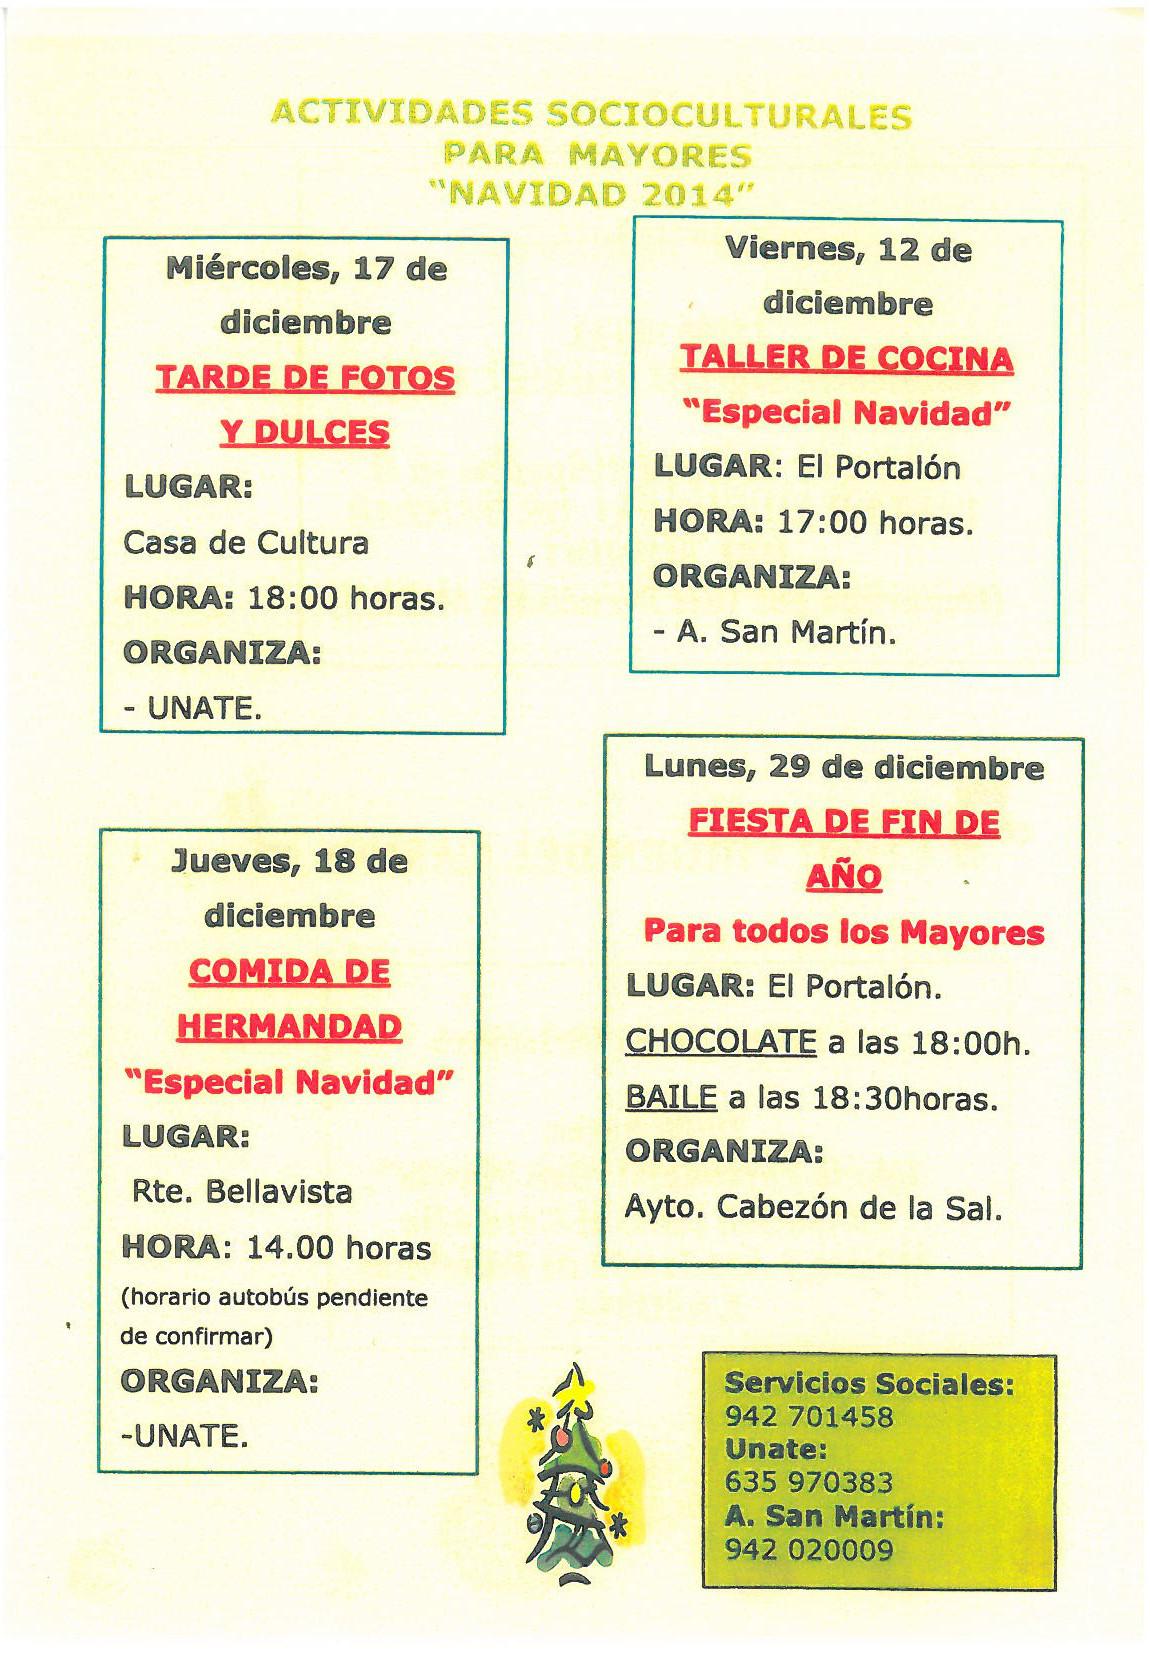 http://www.cabezondelasal.net/wp-content/uploads/2014/12/Sc280sajaco14121011200.jpg